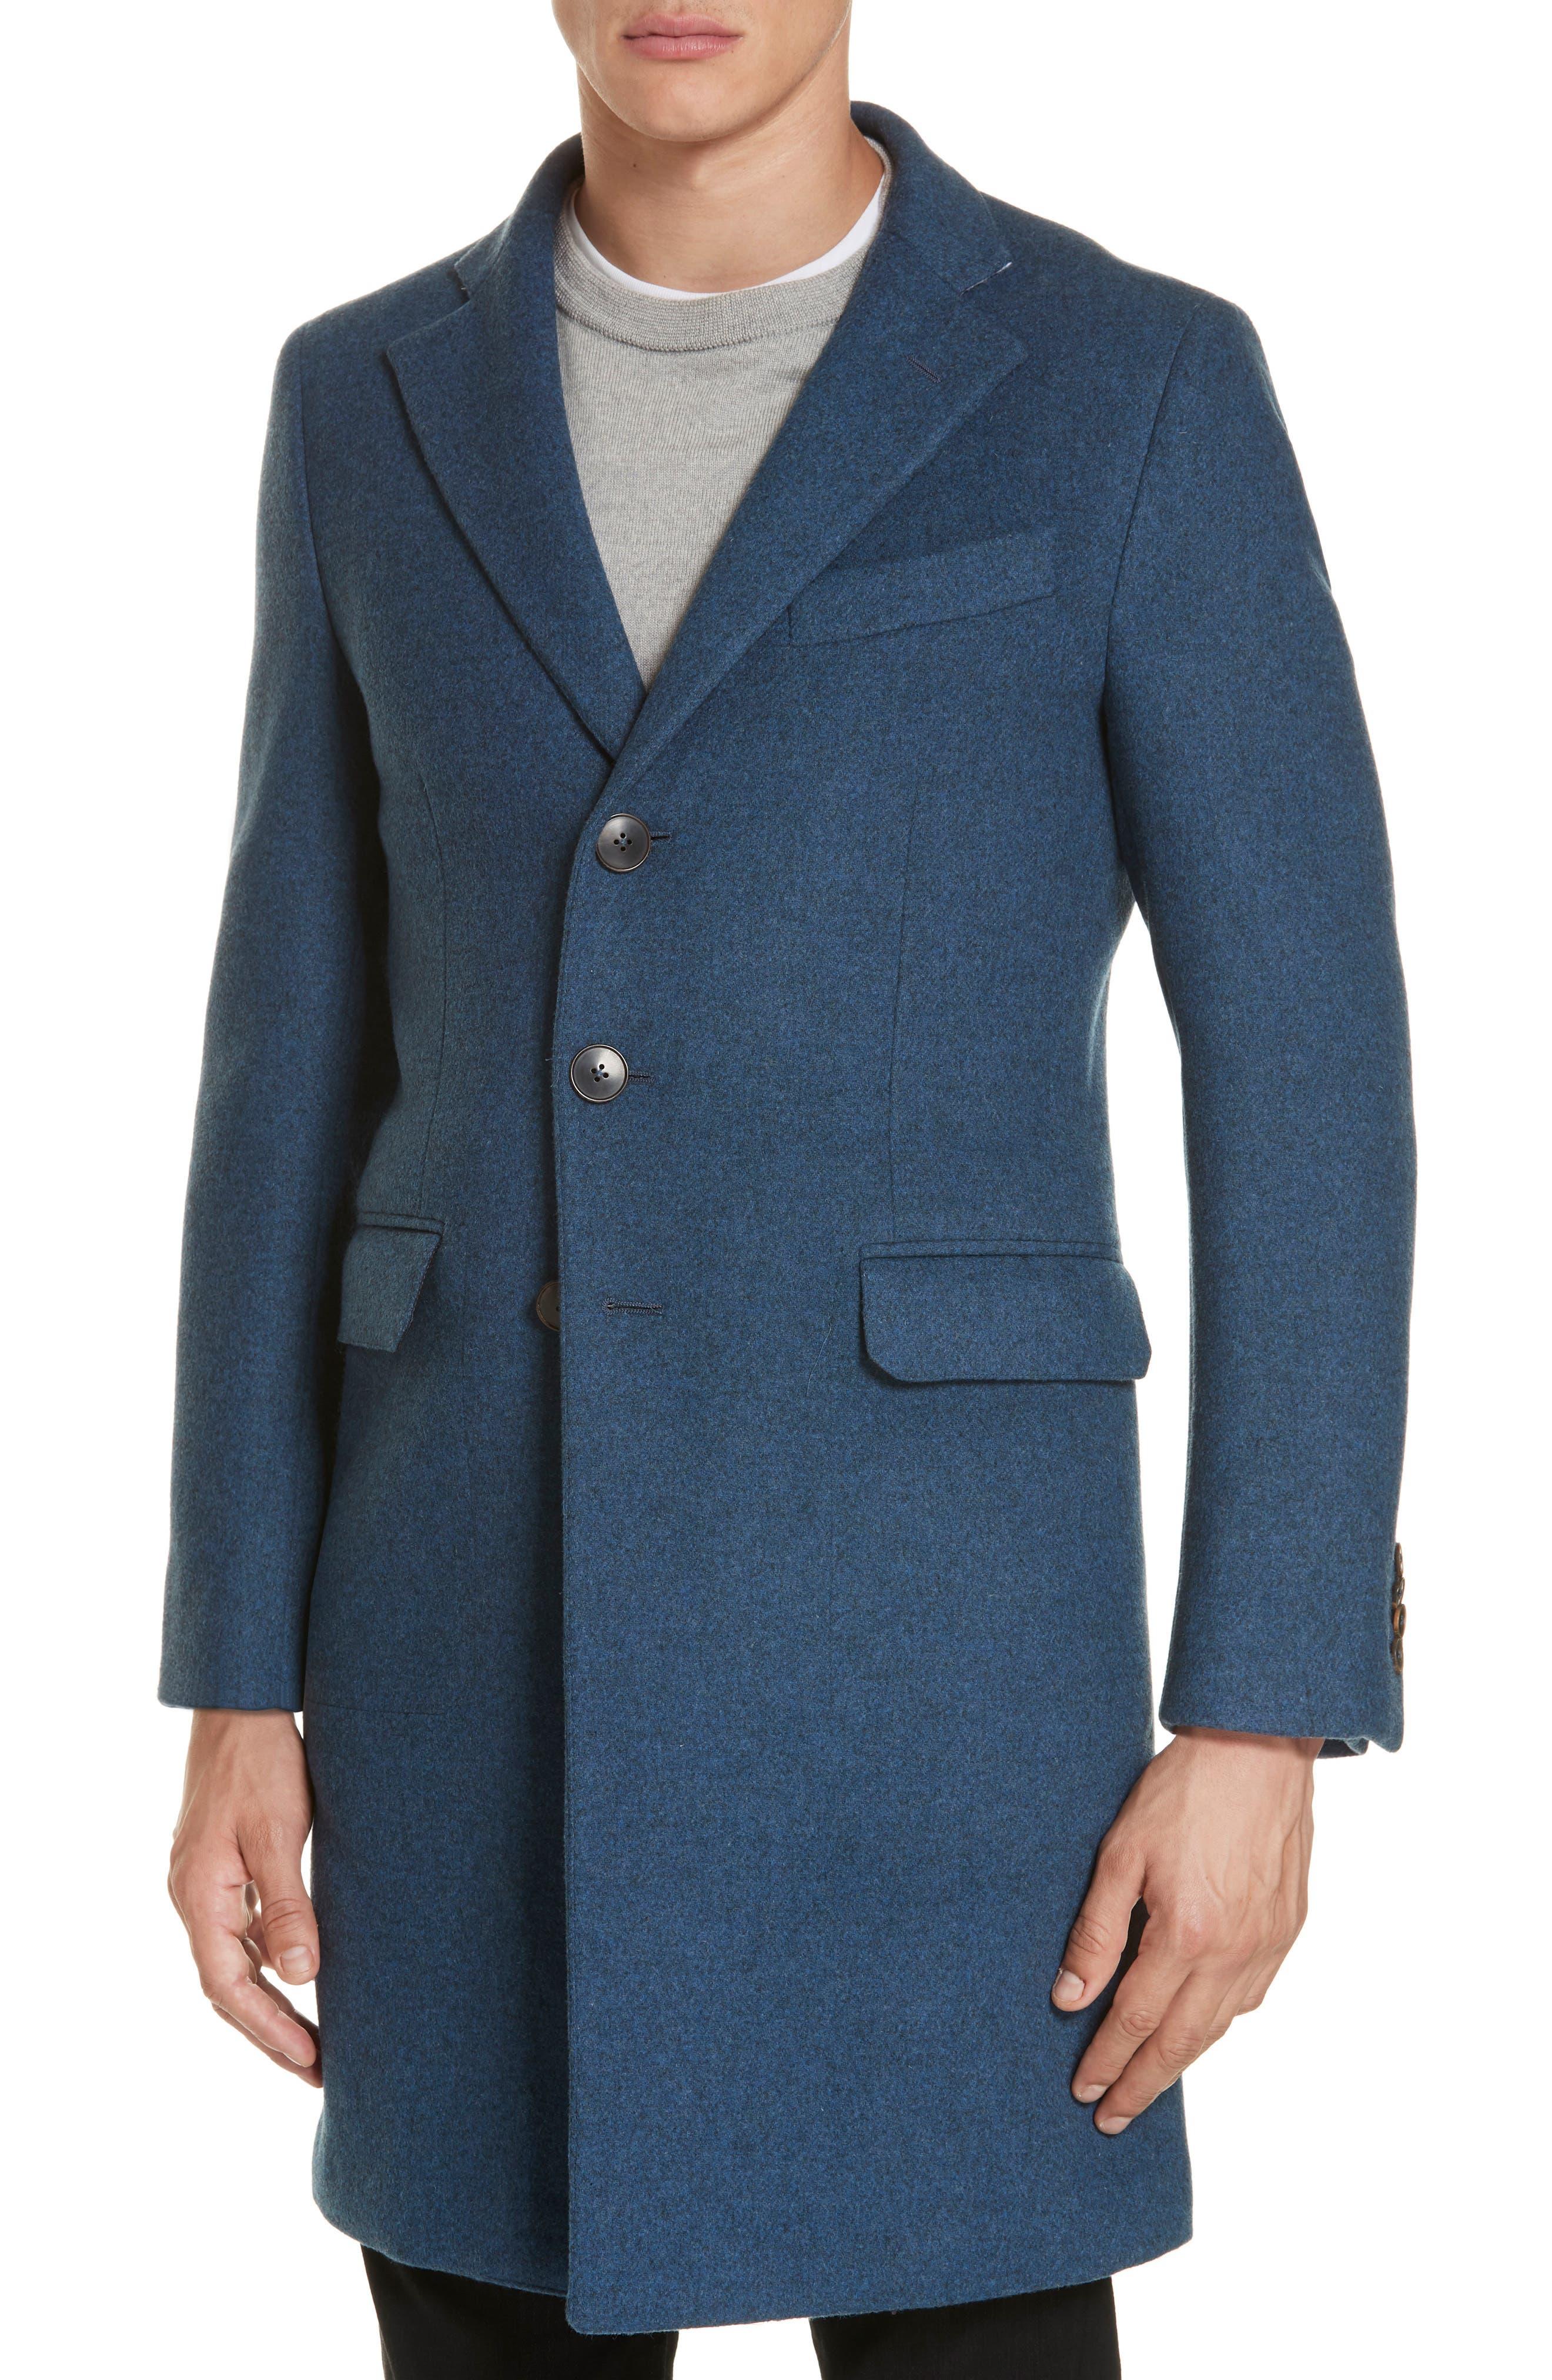 Wool & Cashmere Car Coat,                             Alternate thumbnail 4, color,                             423